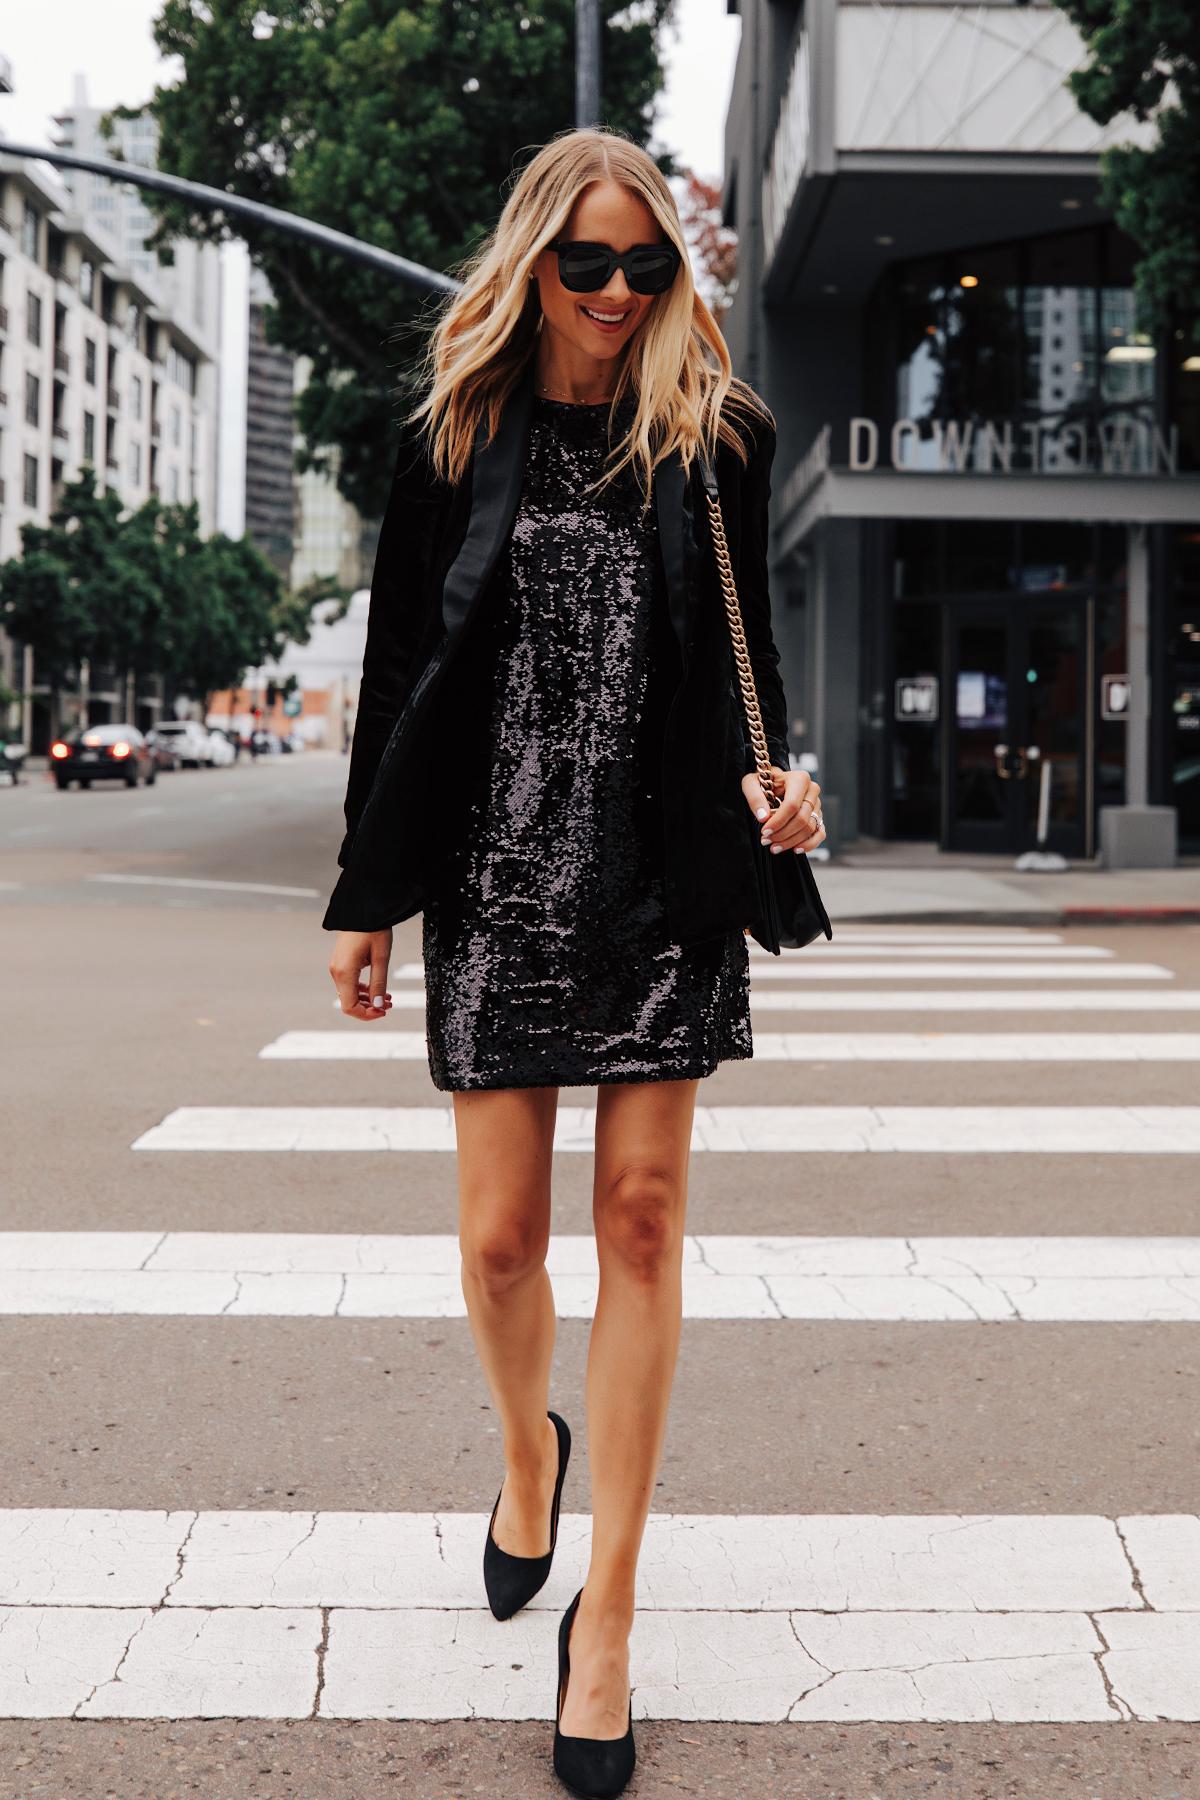 Fashion Jackson Wearing Walmart Black Velvet Blazer Black Sequin Dress Black Pumps 1